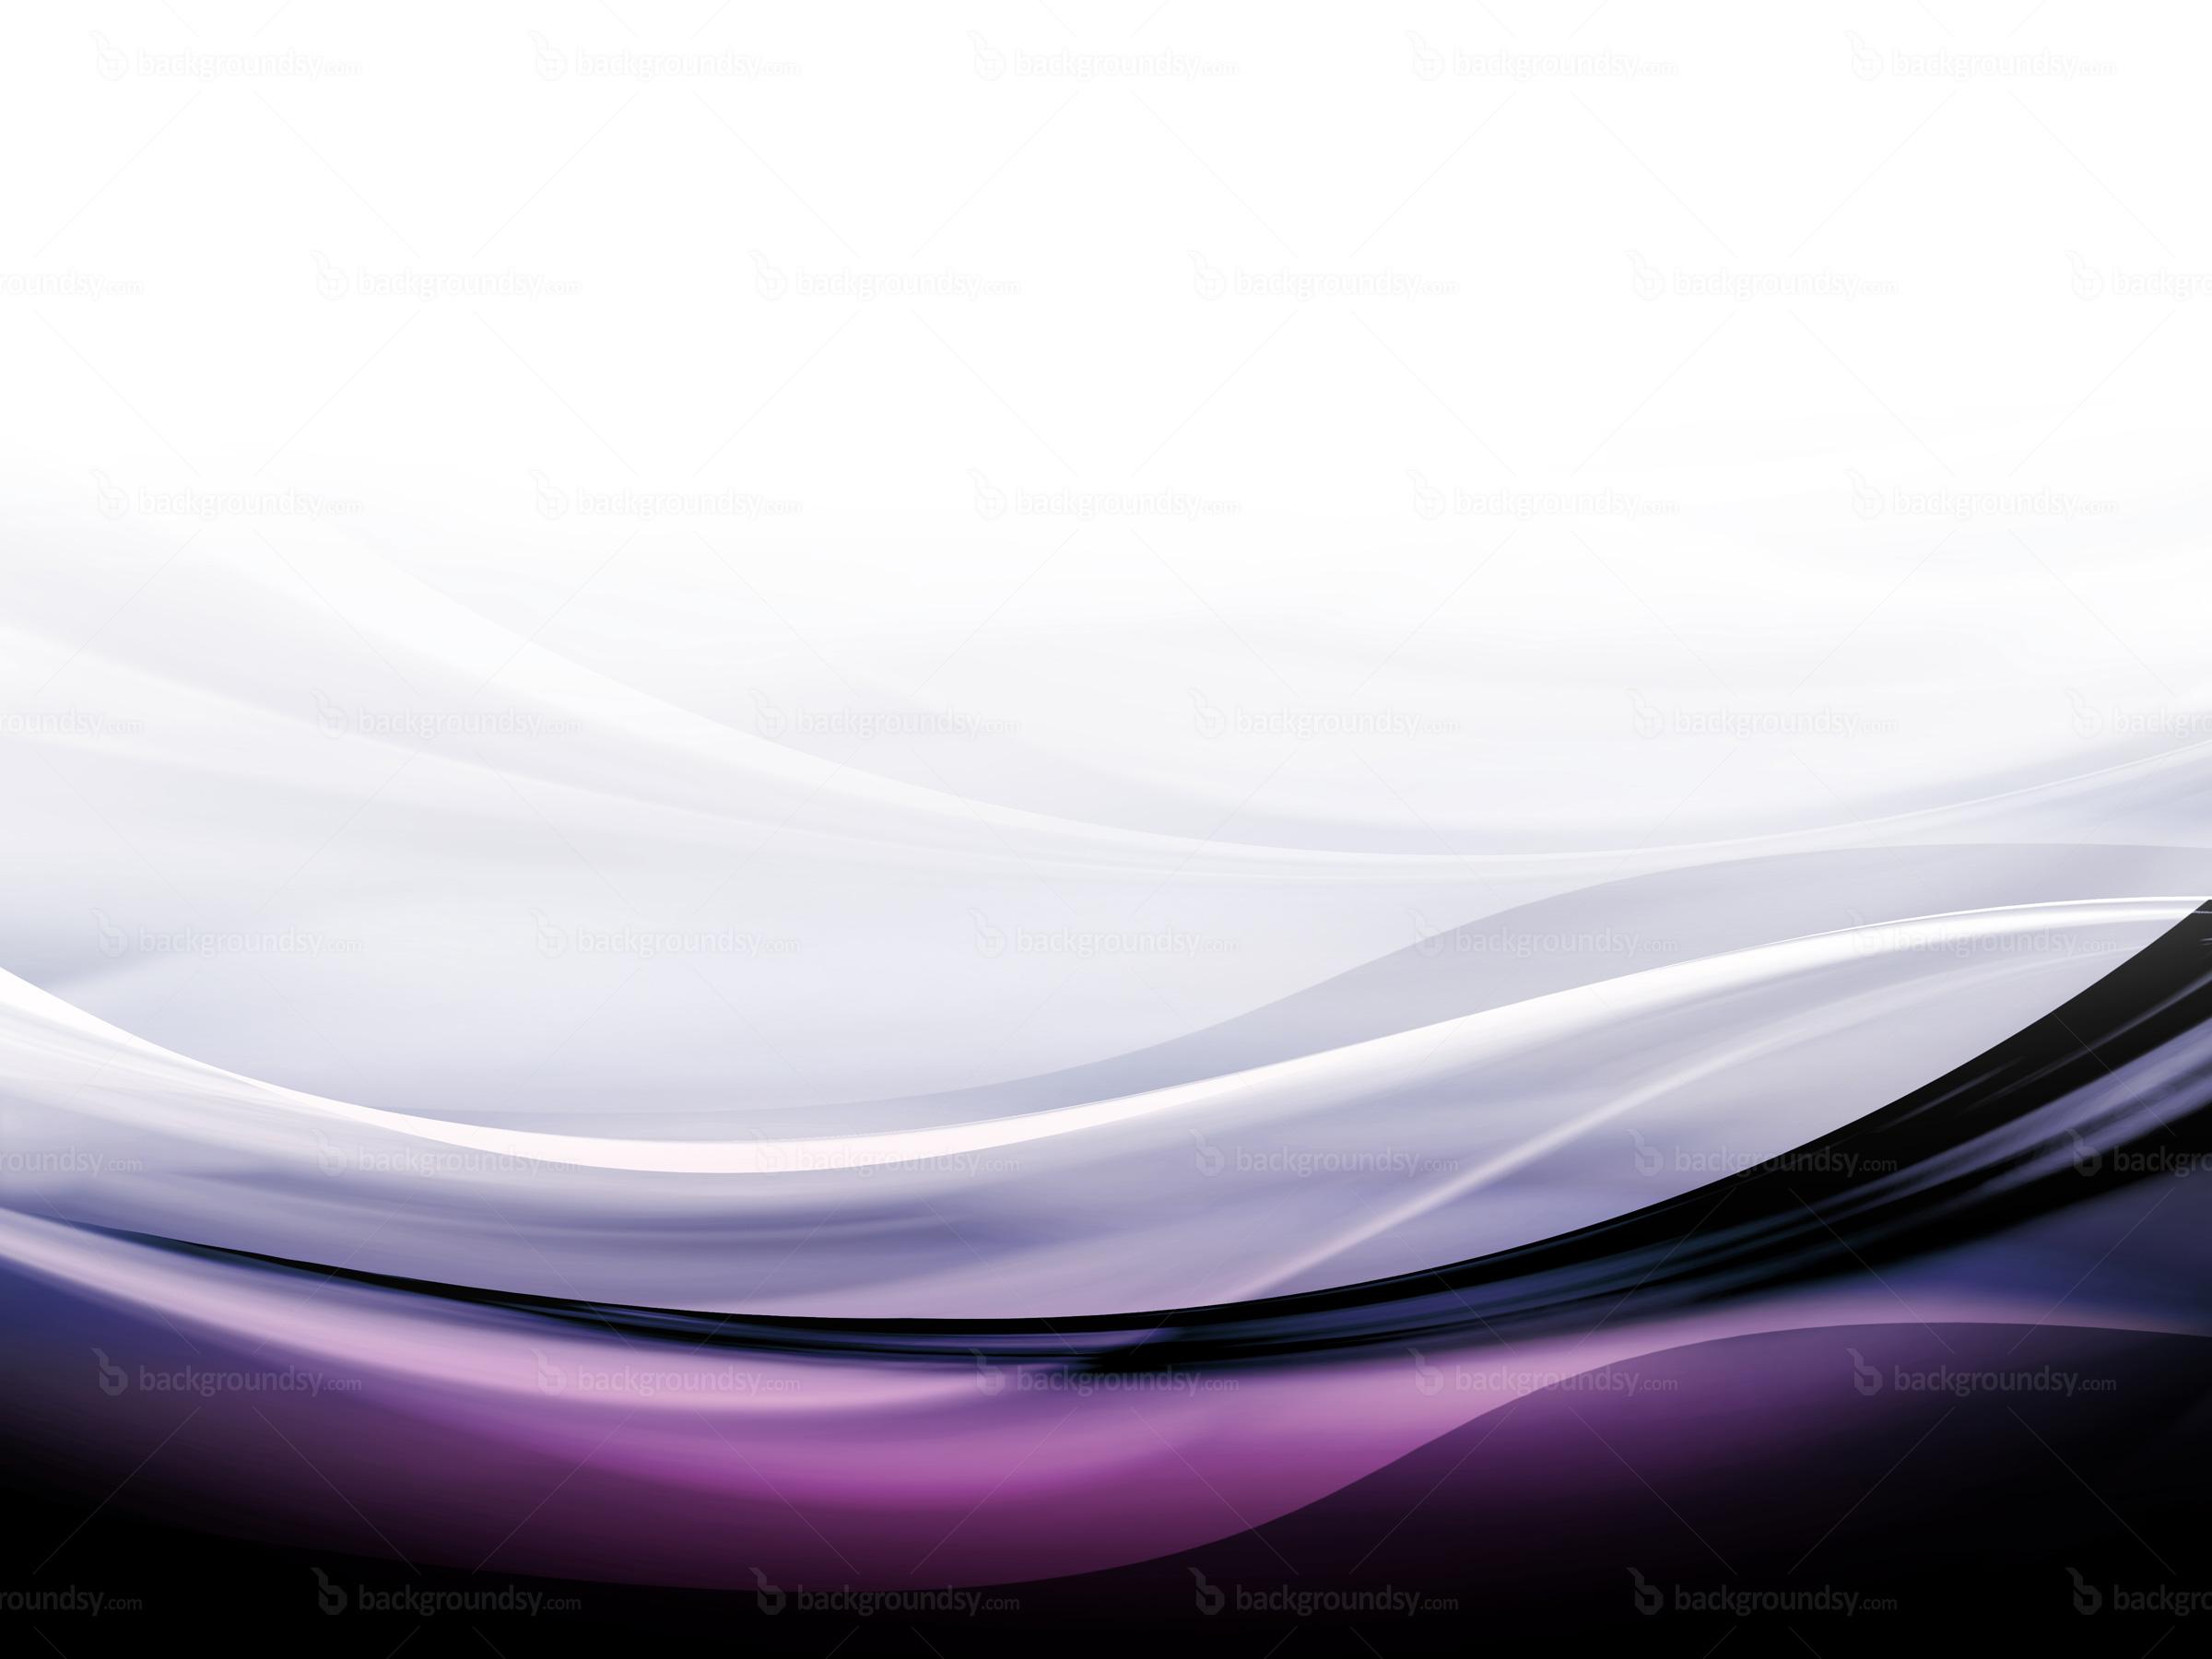 Purple and White Wallpaper - WallpaperSafari